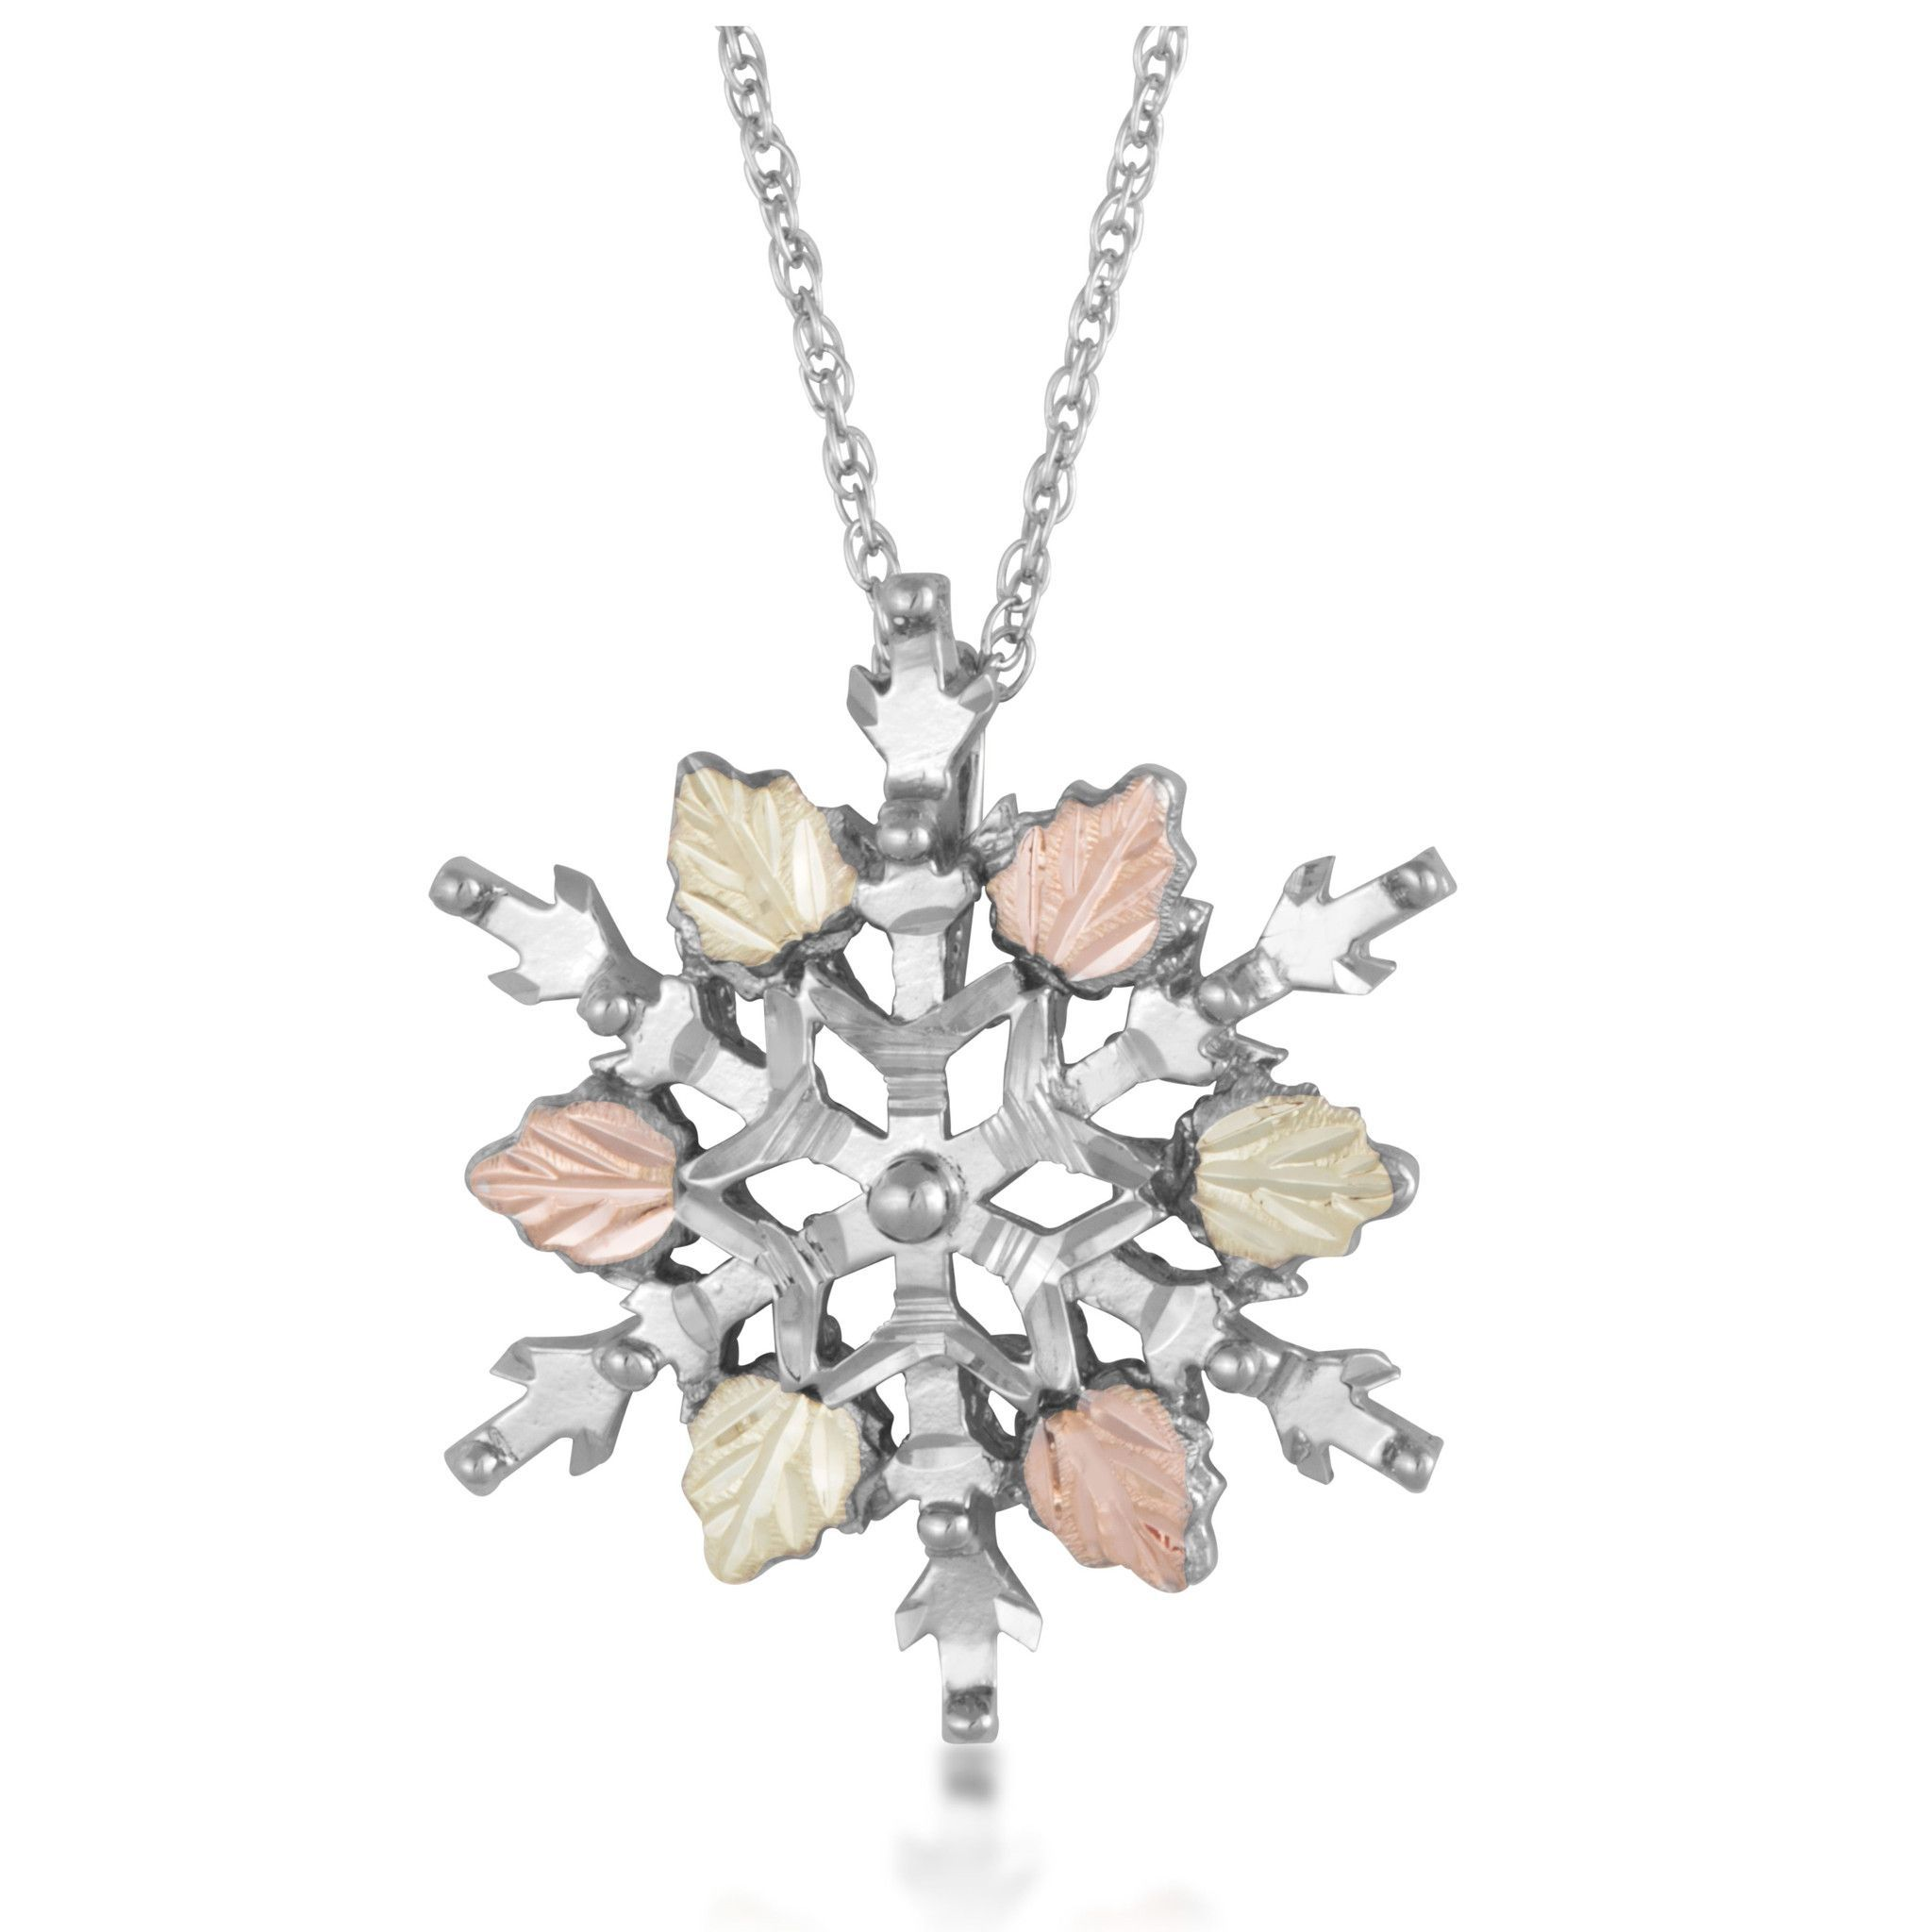 Sterling silver black hills gold snowflake pendant necklace sterling silver gold snowflake pendant necklace aloadofball Images